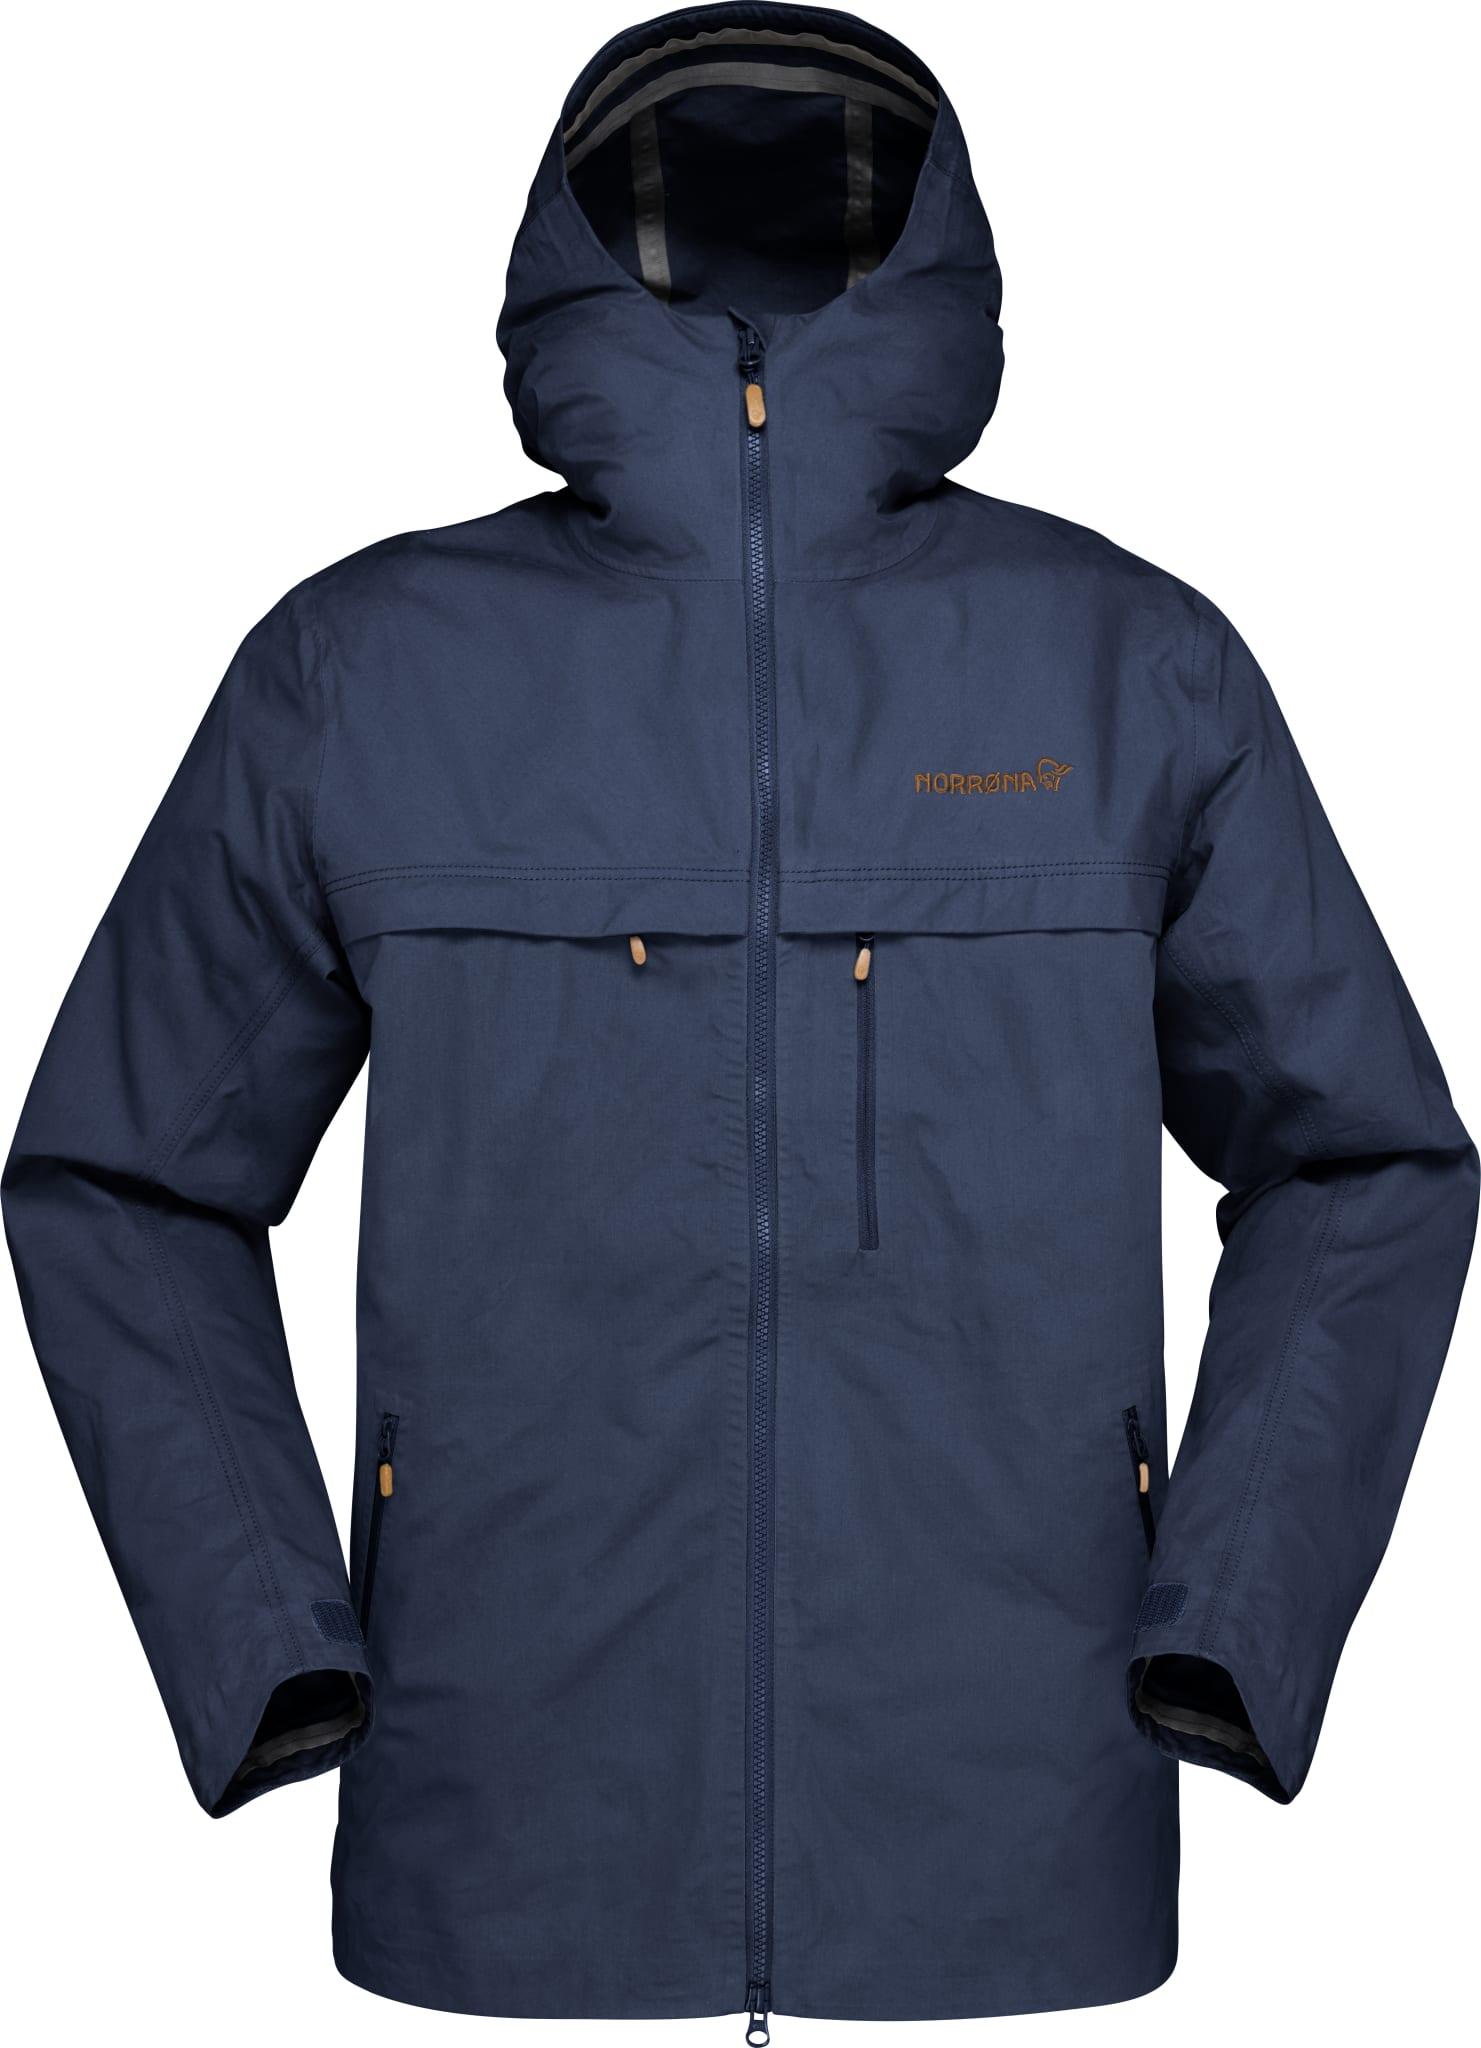 Svalbard Cotton Jacket M